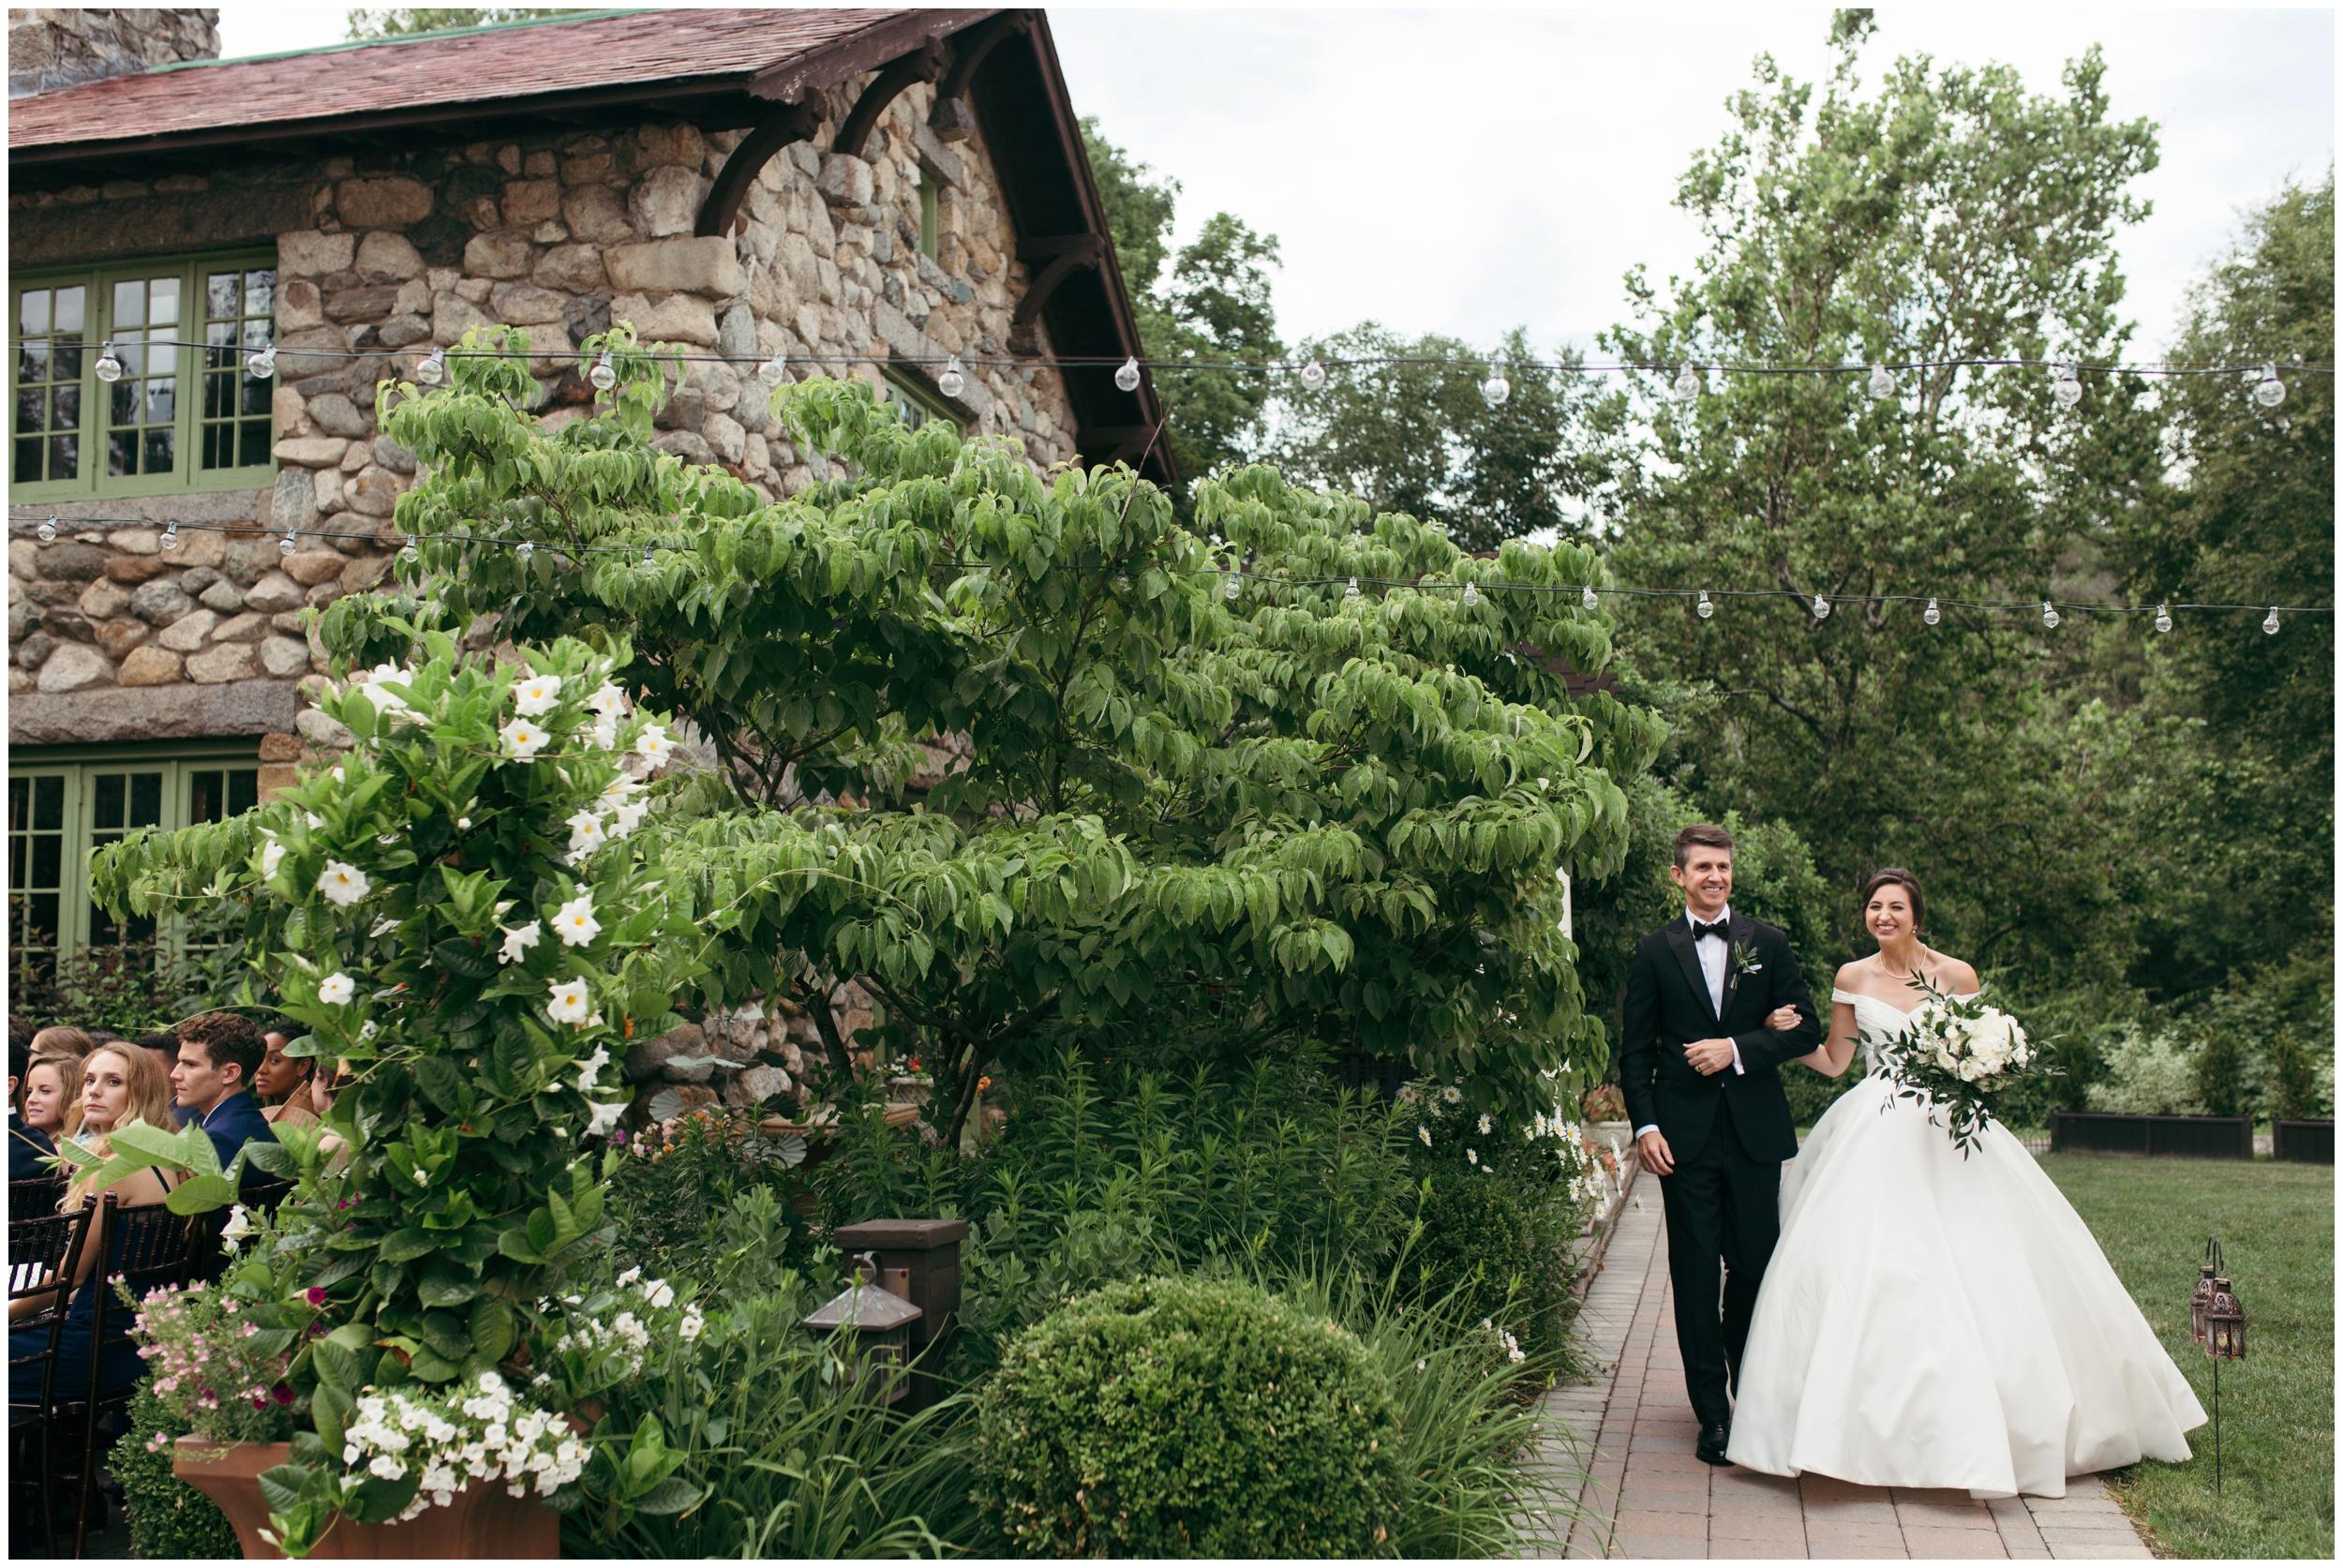 Willowdale-Estate-Wedding-Bailey-Q-Photo-Boston-Wedding-Photographer-027.JPG